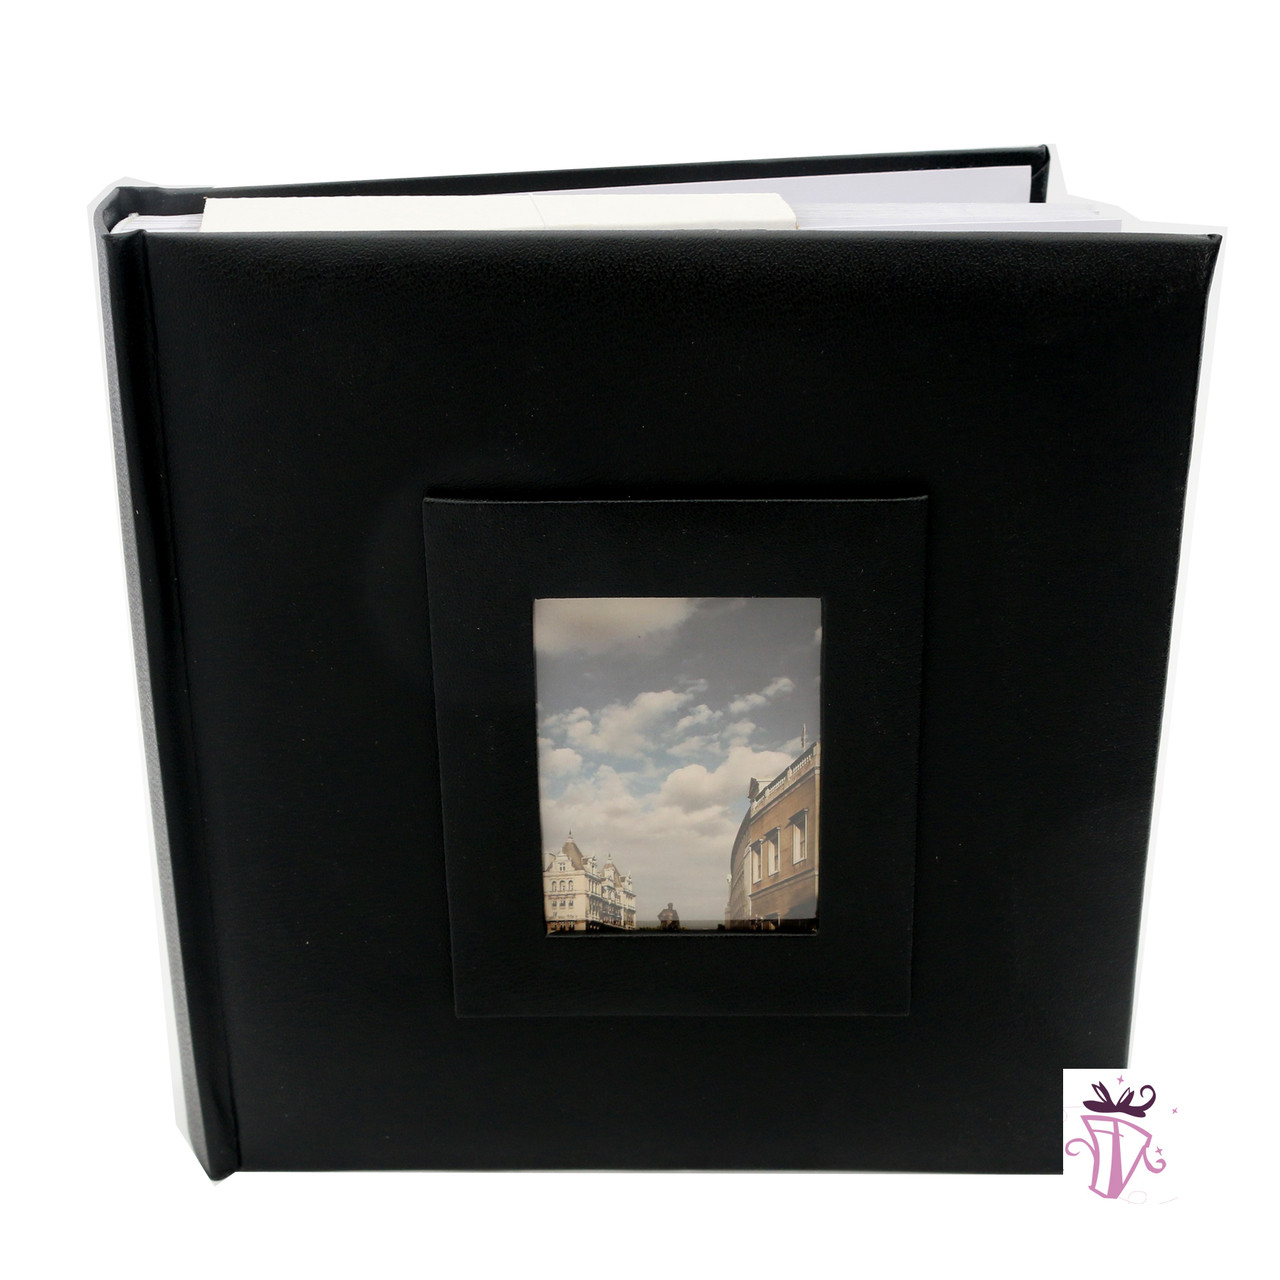 Quality Photo Albums: 200 Photo Slip In Archival Quality Photo Album Black Cover